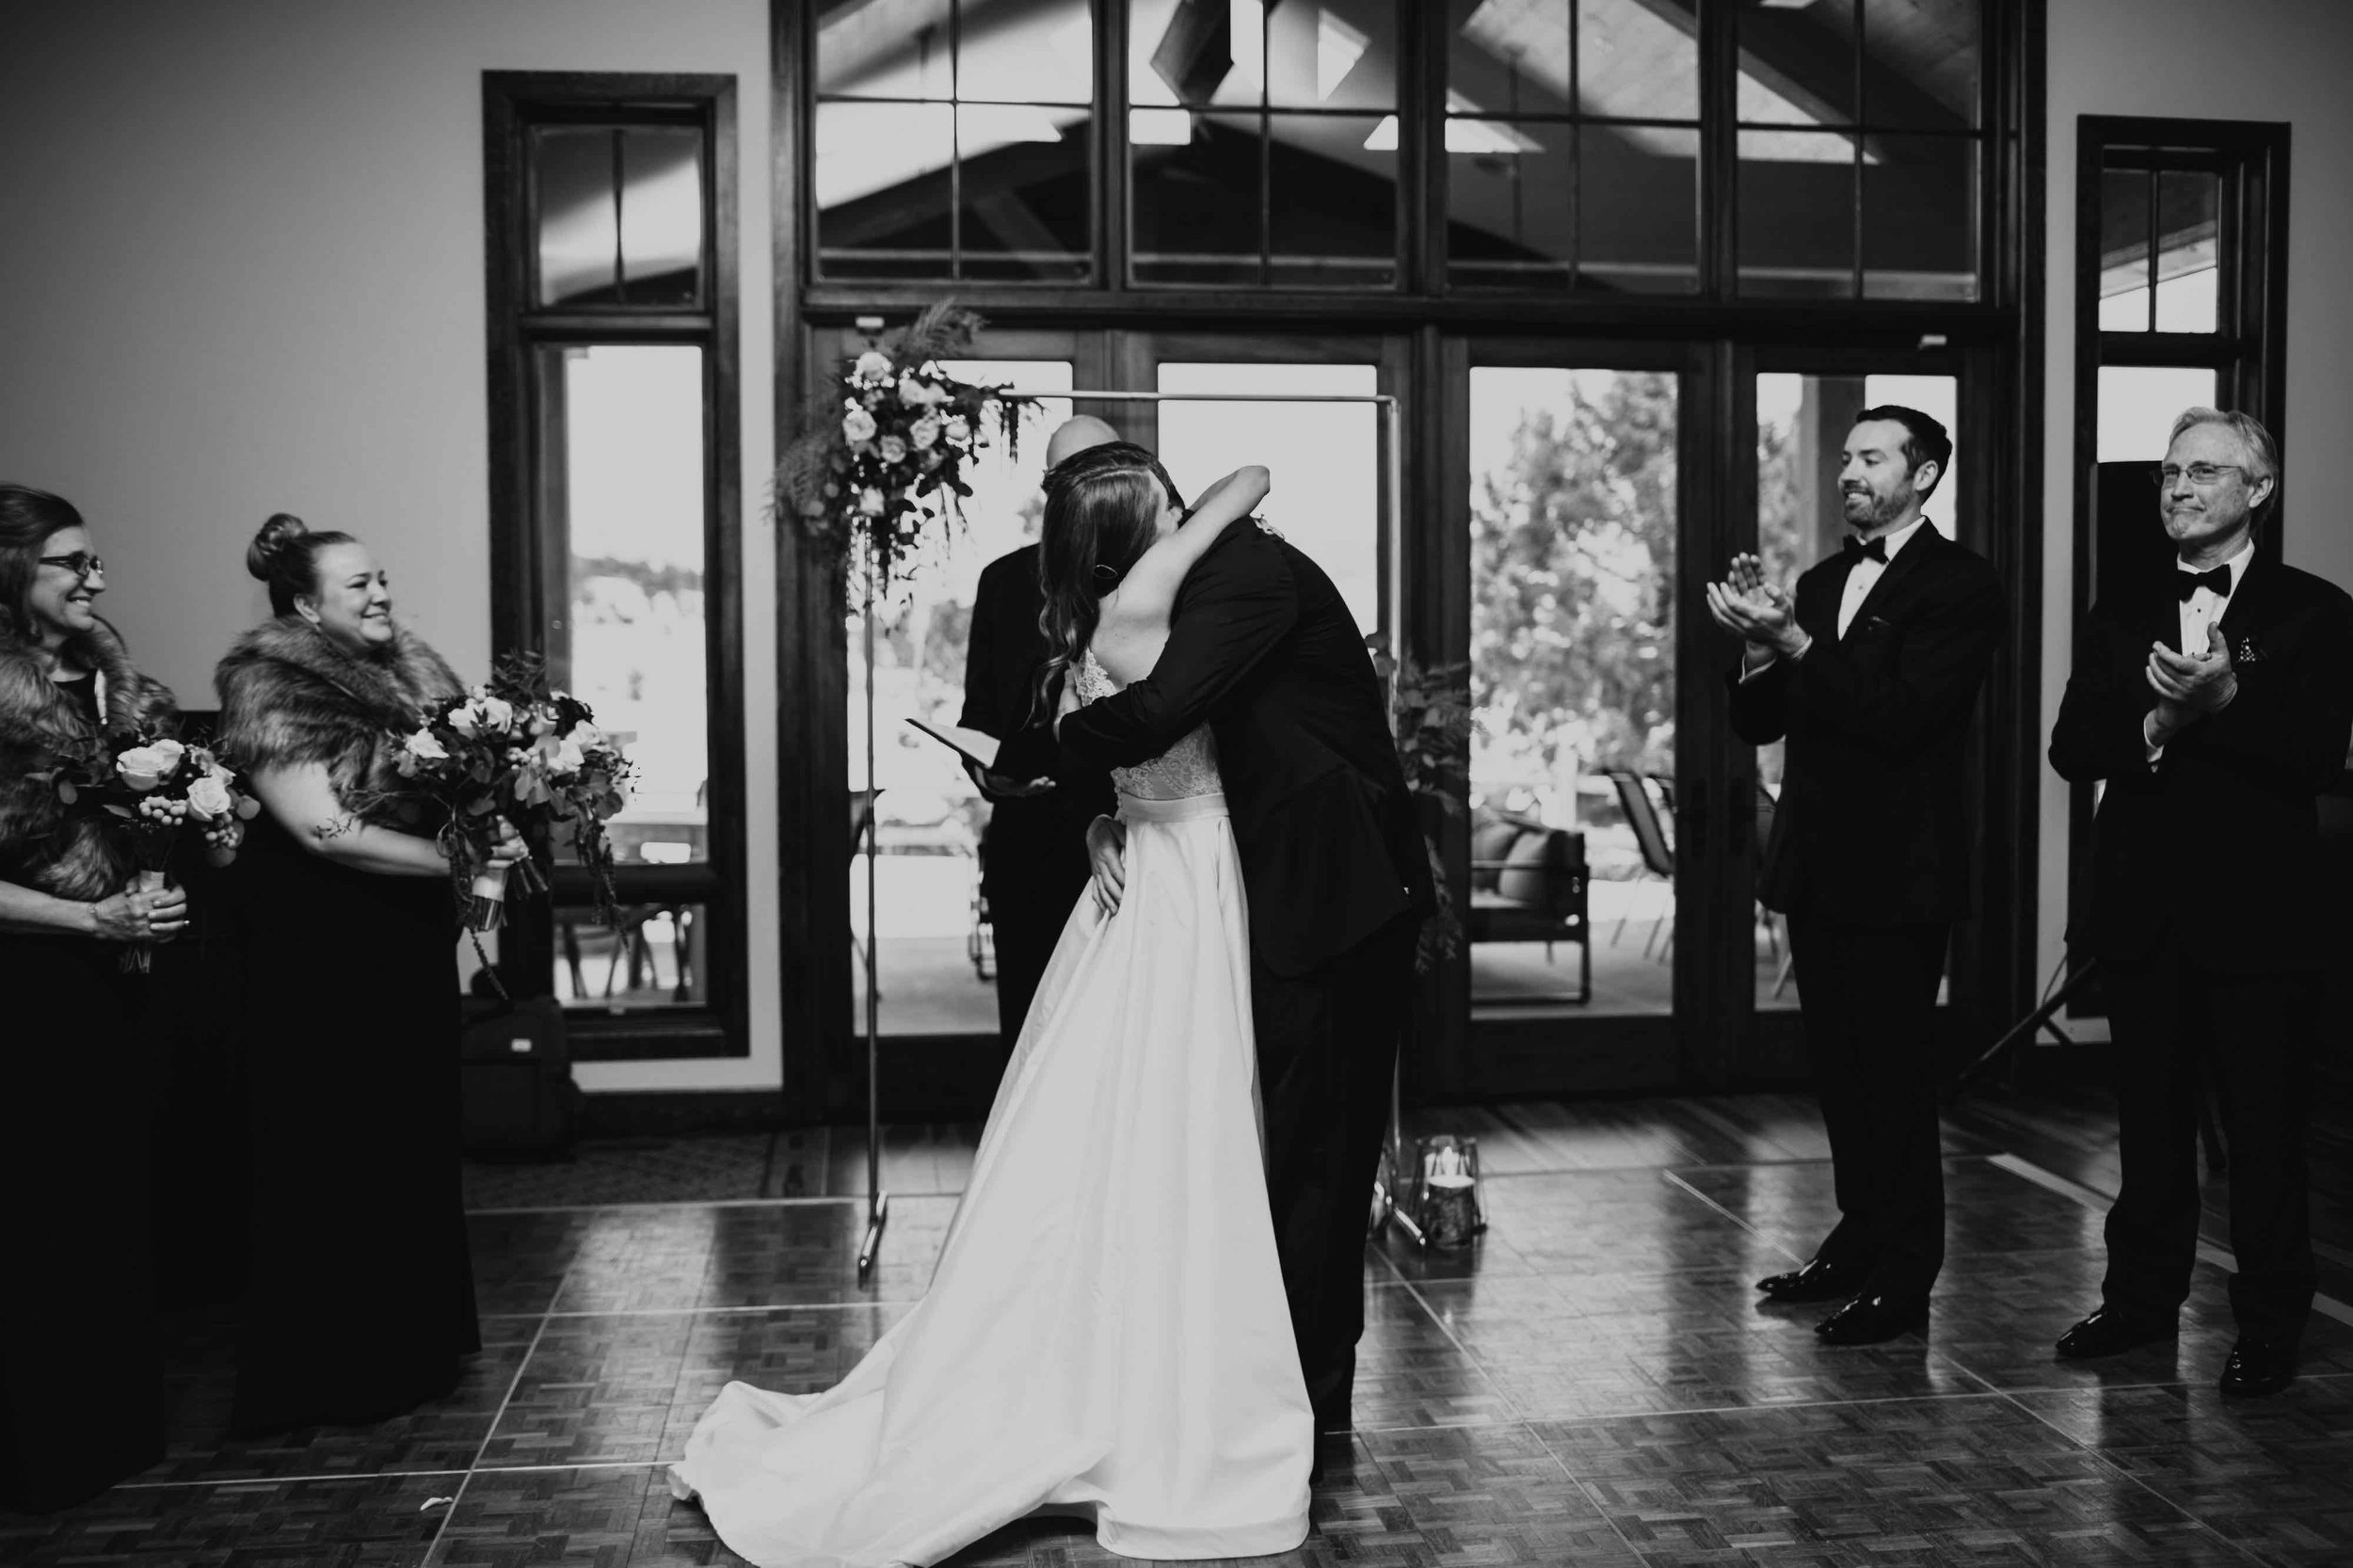 Kisa Conrad Favorites-0005-colorado-wedding-photographer-denver-springs-vailhotel-glenwood-springs-colorado-wedding-photographer.jpeg